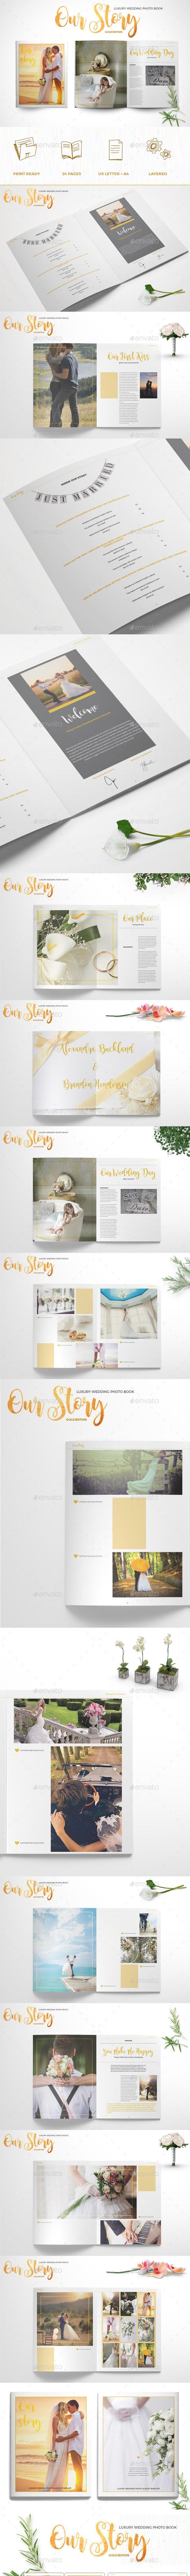 Luxury Wedding Photo Book - Photo Albums Print Templates